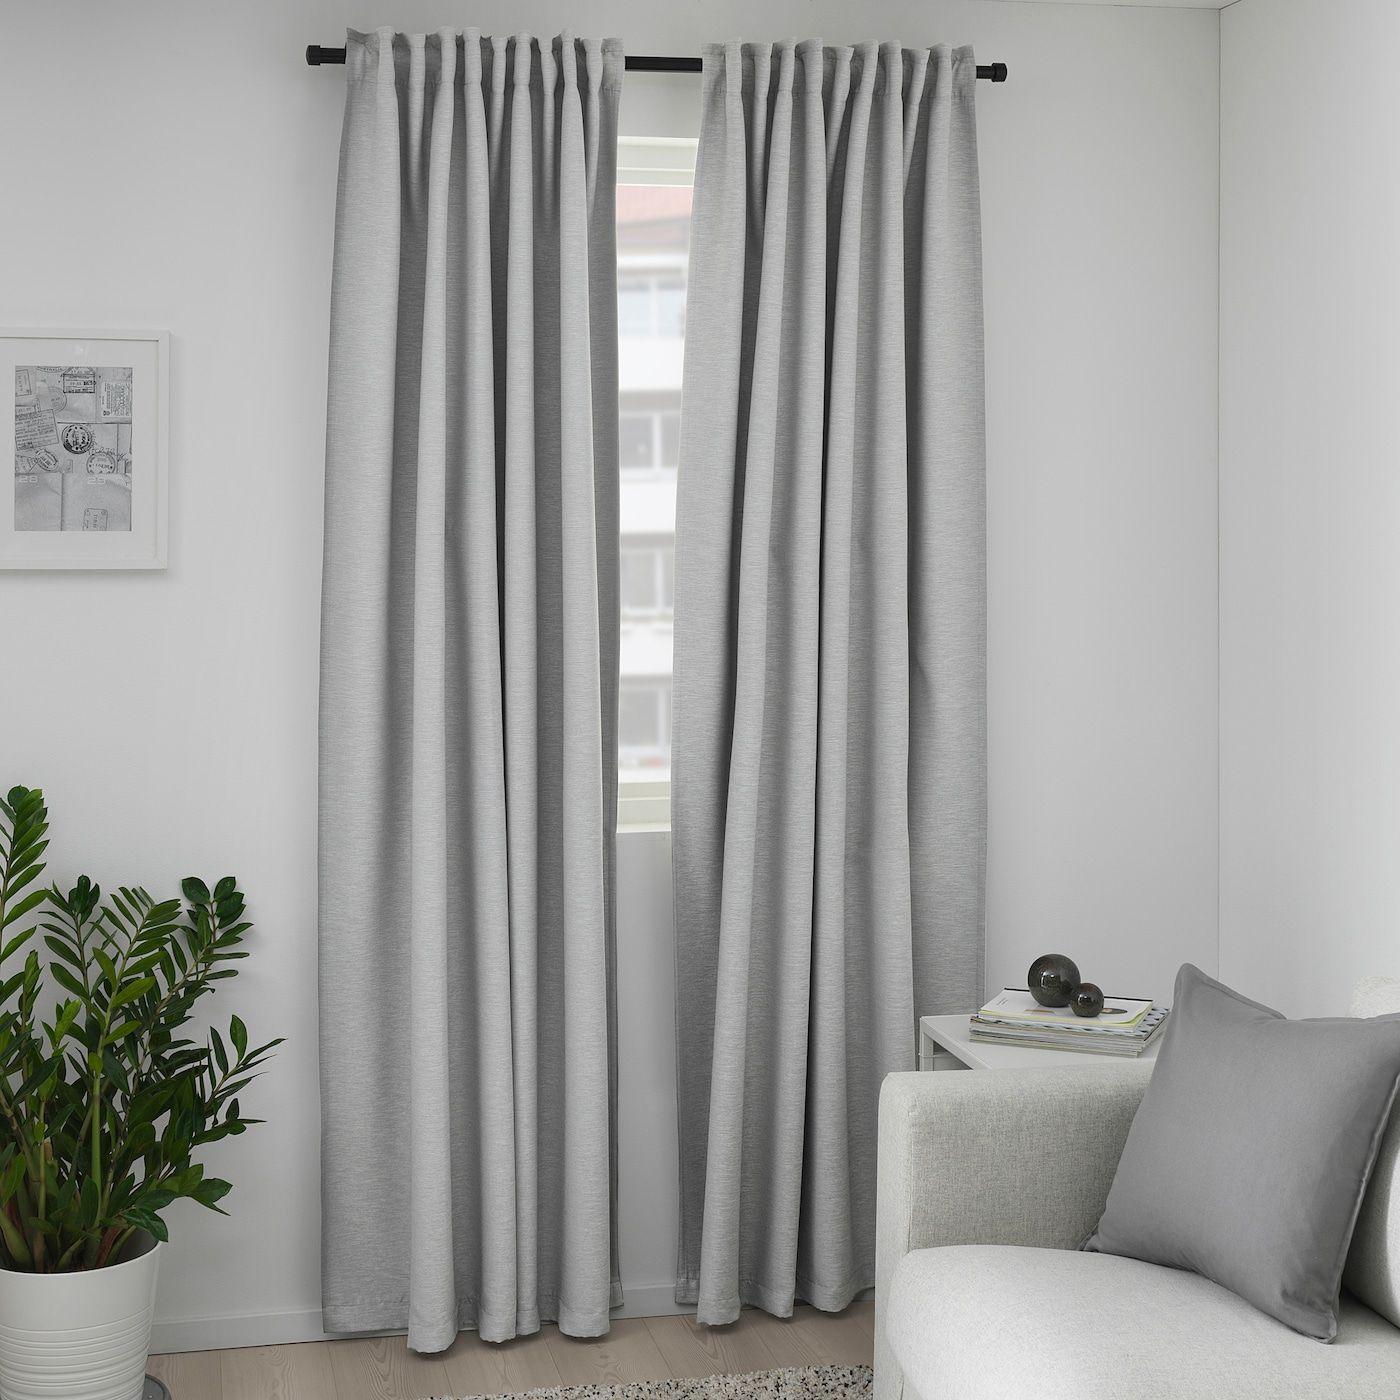 Vilborg Room Darkening Curtains 1 Pair Grey In 2020 Curtains